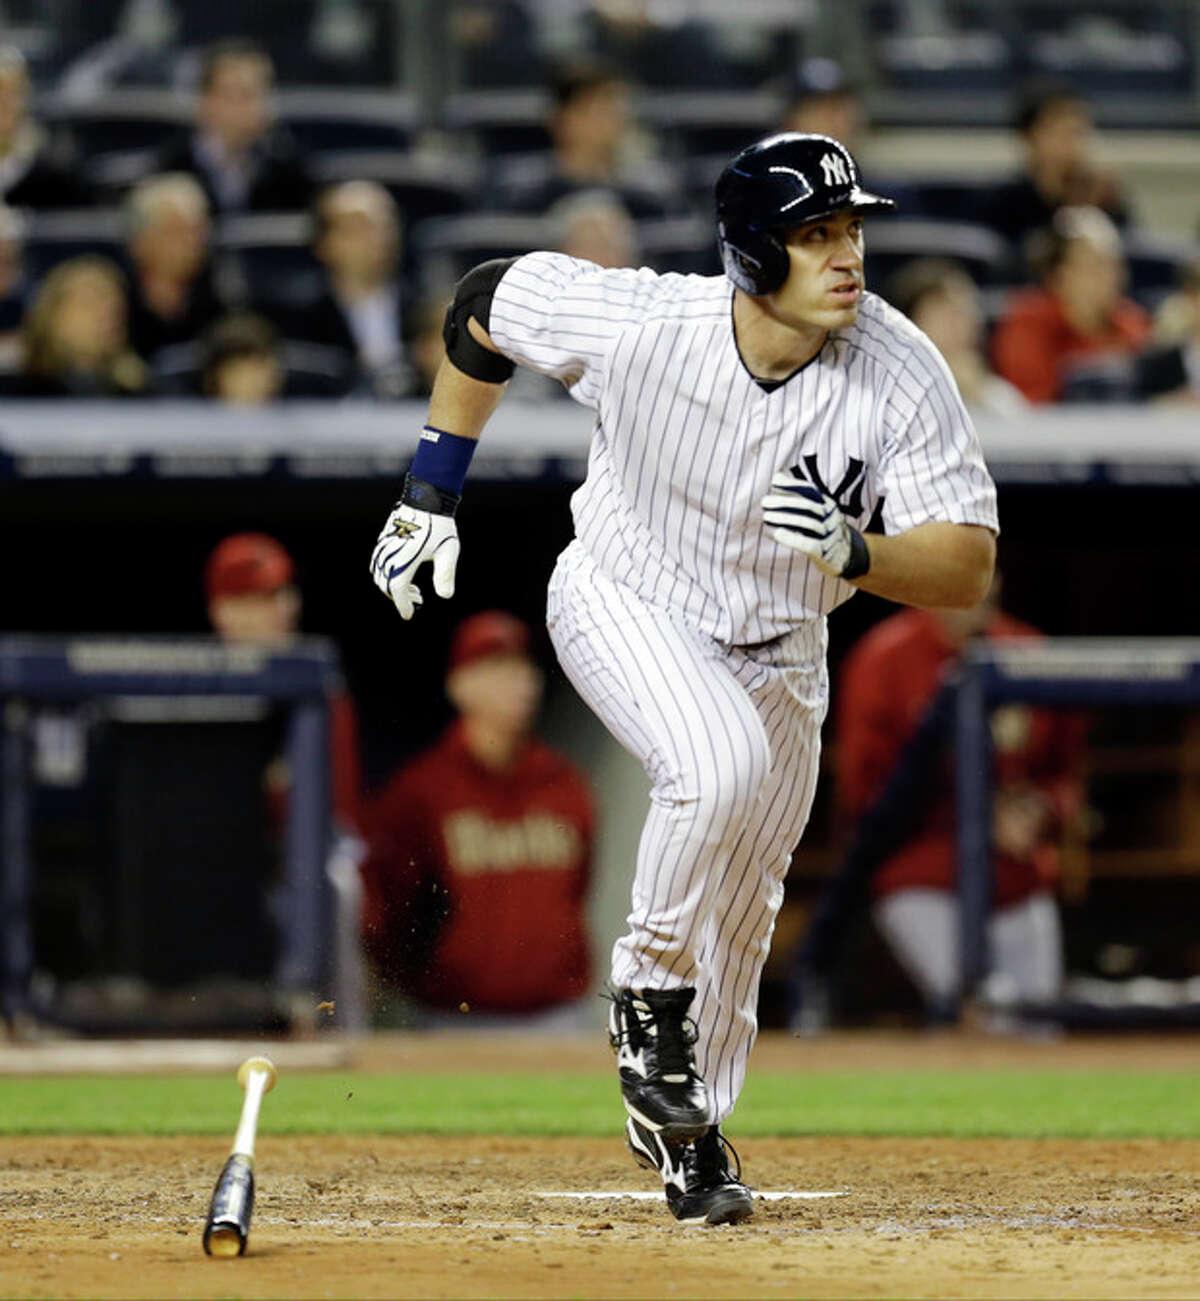 New York Yankees designated hitter Travis Hafner watches his eighth-inning, solo home run in a baseball game against the Arizona Diamondbacks at Yankee Stadium in New York, Wednesday, April 17, 2013. (AP Photo/Kathy Willens)